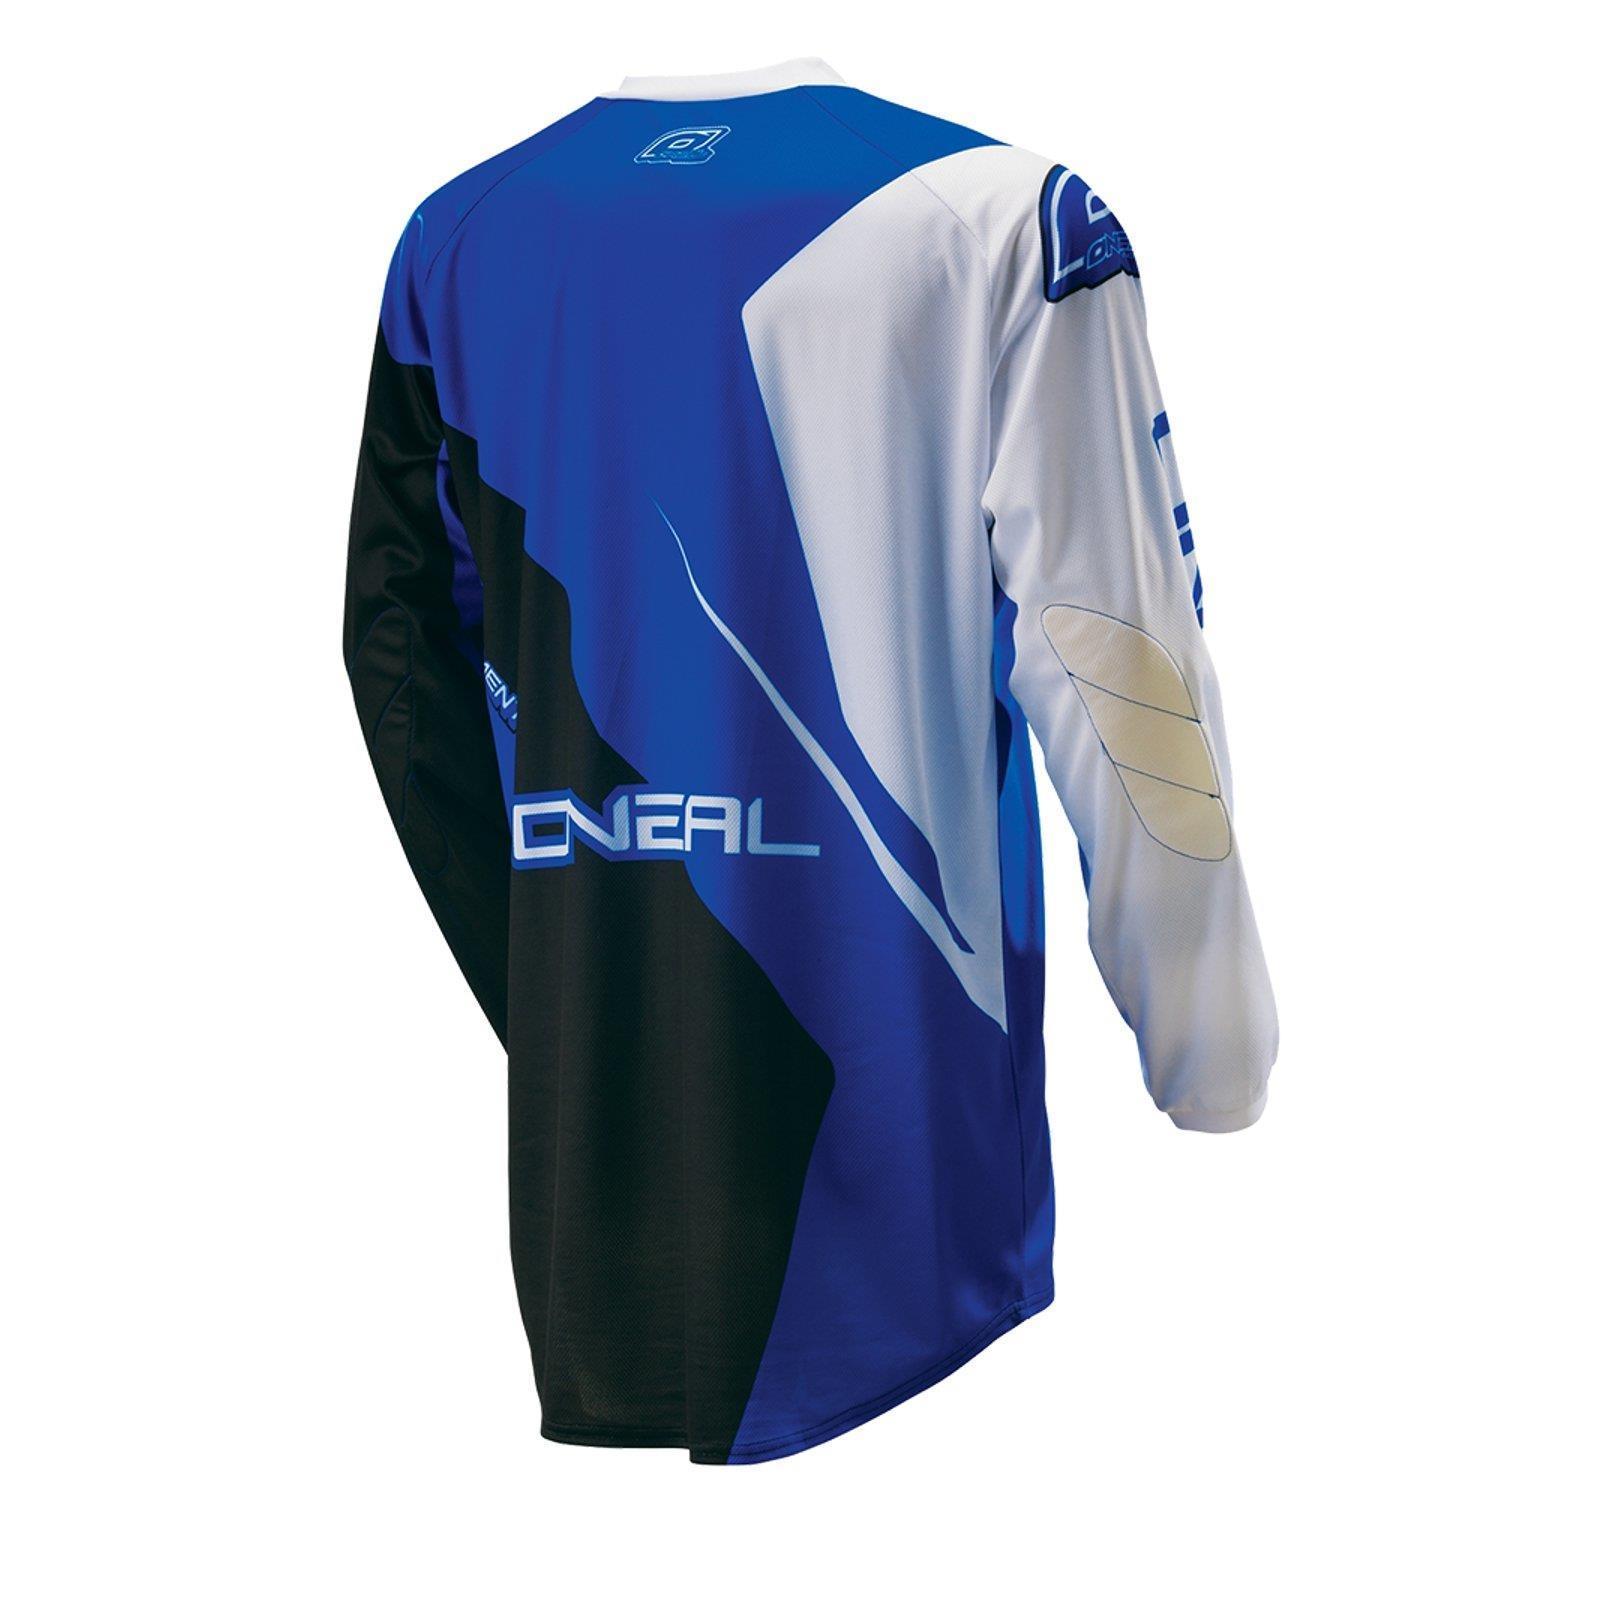 O-039-Neal-elemento-Mayhem-JERSEY-Racewear-Motocross-Maglia-MX-DH-FR-MTB-MOUNTAIN-BIKE miniatura 106